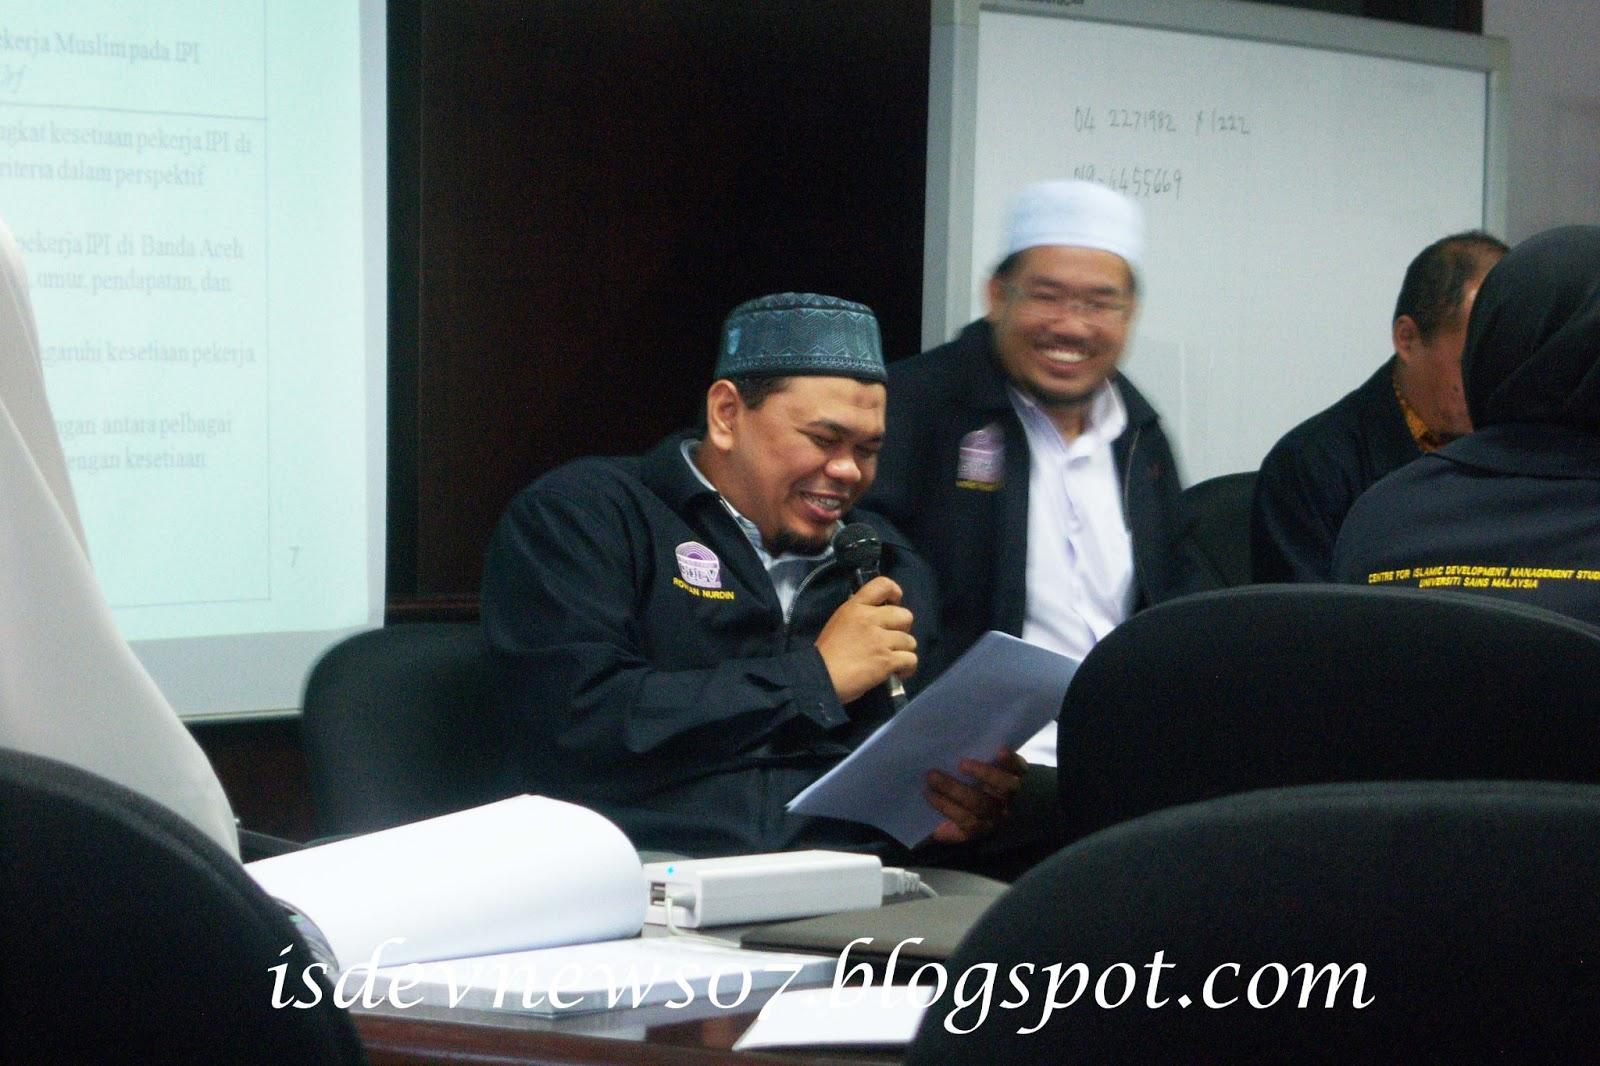 Phd Proposal Presentation